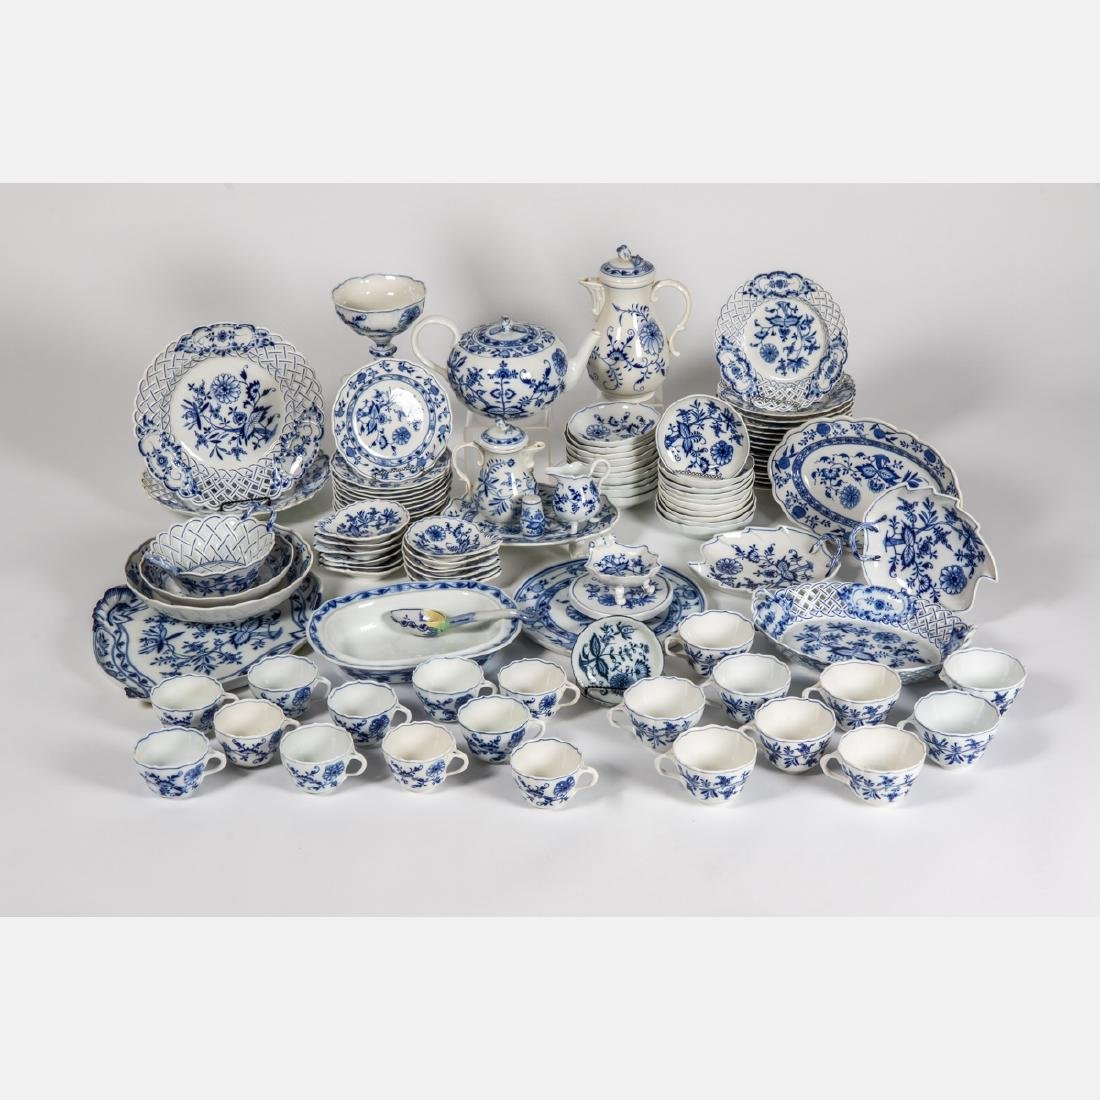 A Meissen Porcelain Dinner Service in the Blue Onion